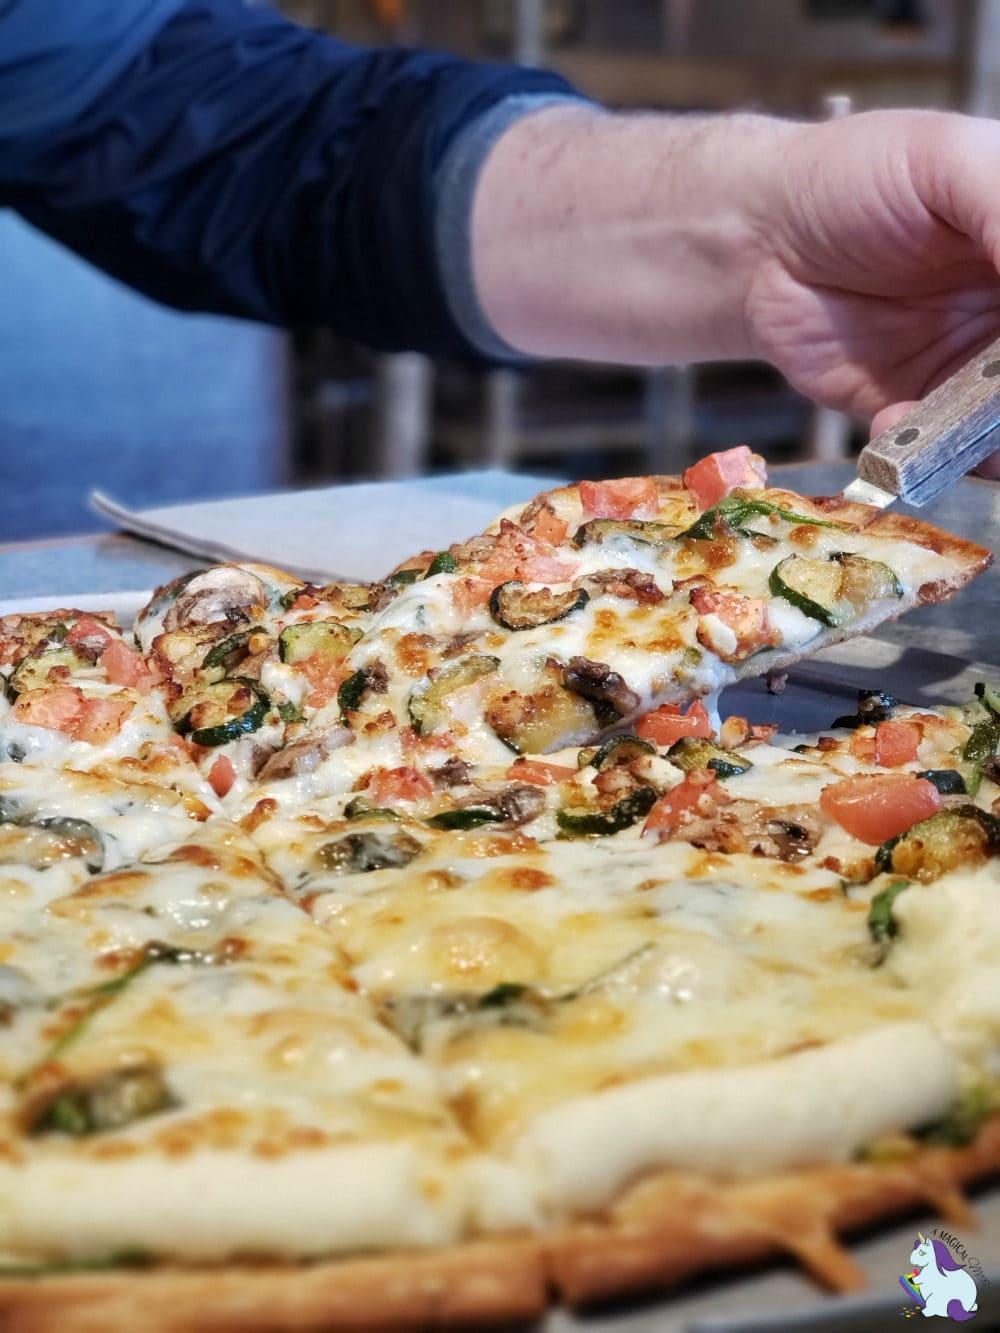 MacKenzie River Pizza in Bozeman